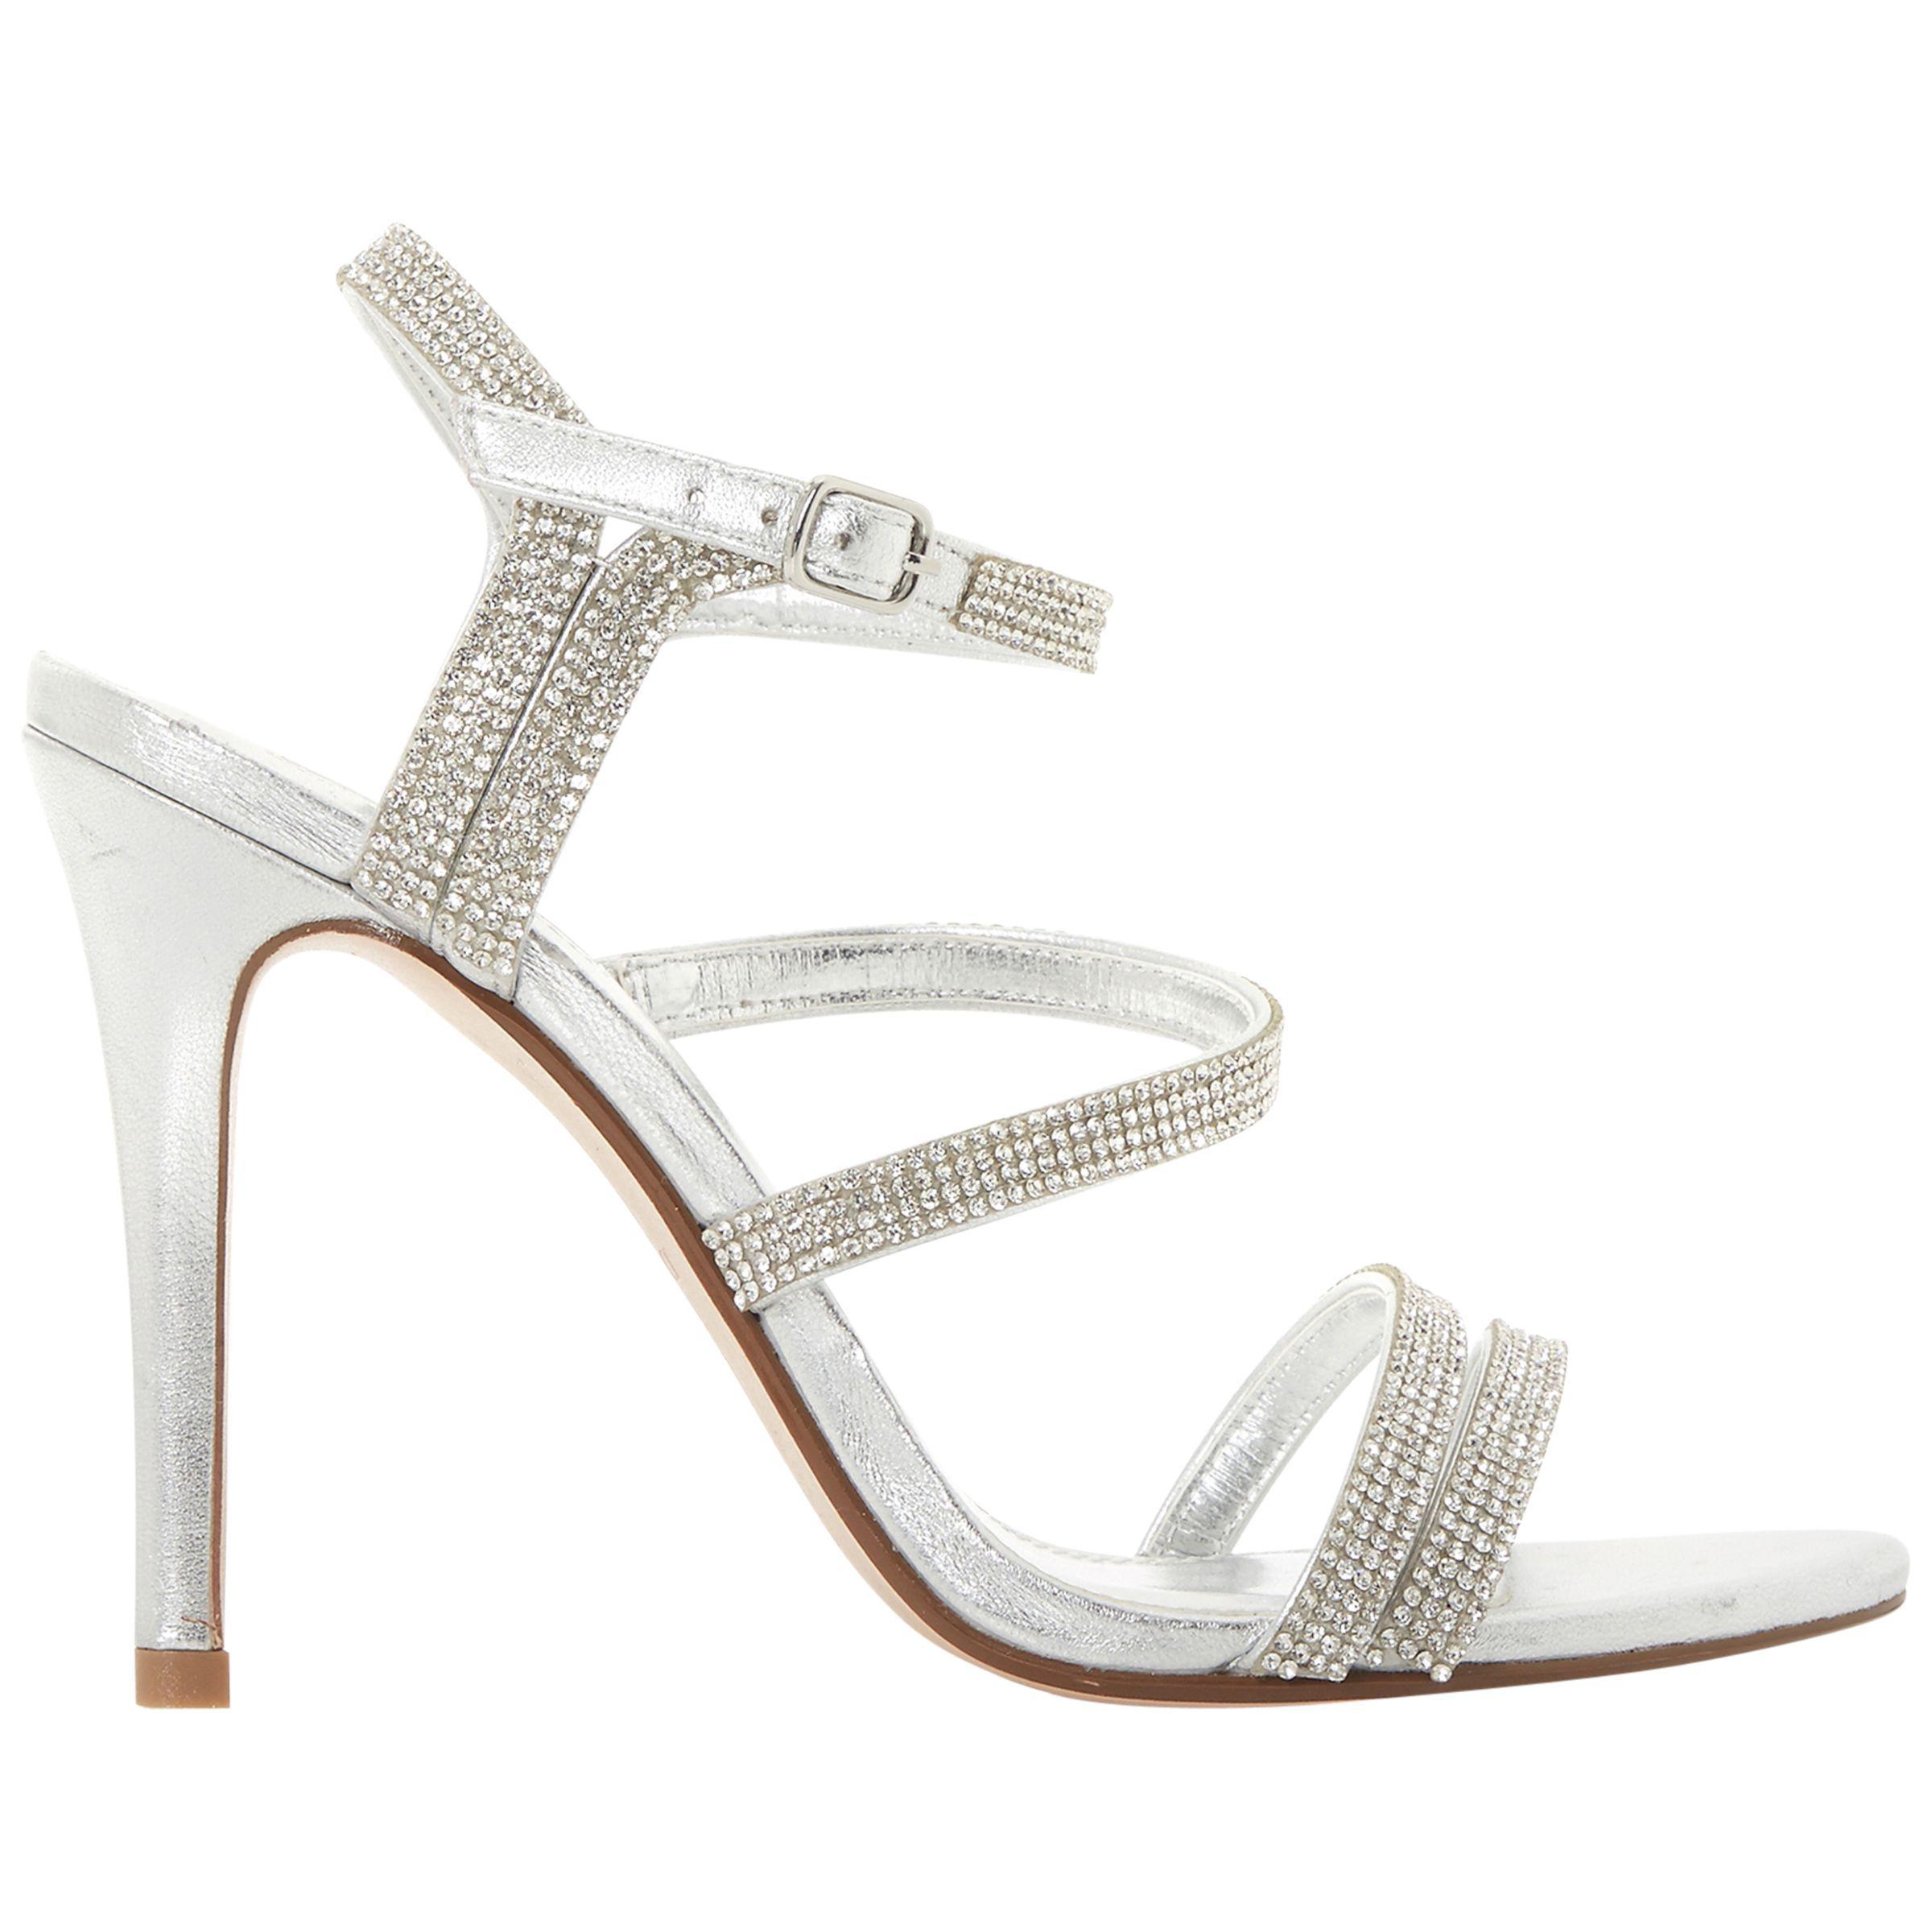 391b612a5847 Dune Madonna Embellished Strappy Stiletto Heel Sandals in Metallic ...